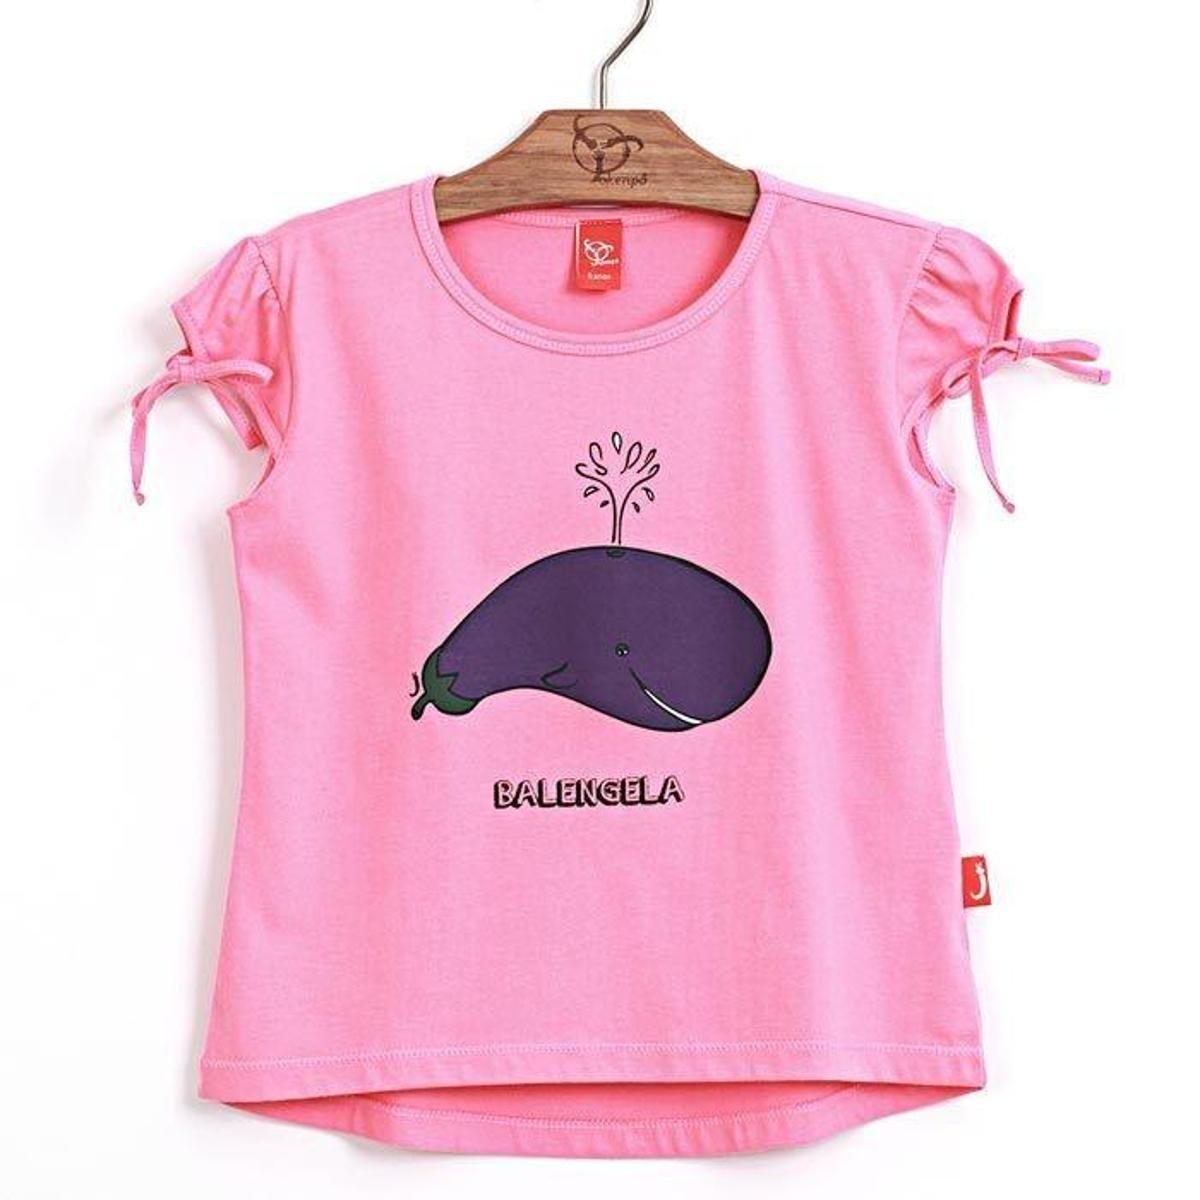 Jokenpô Blusa Blusa Balengela Infantil Jokenpô Infantil Infantil Balengela Pink Jokenpô Pink Blusa rr7Cndwq